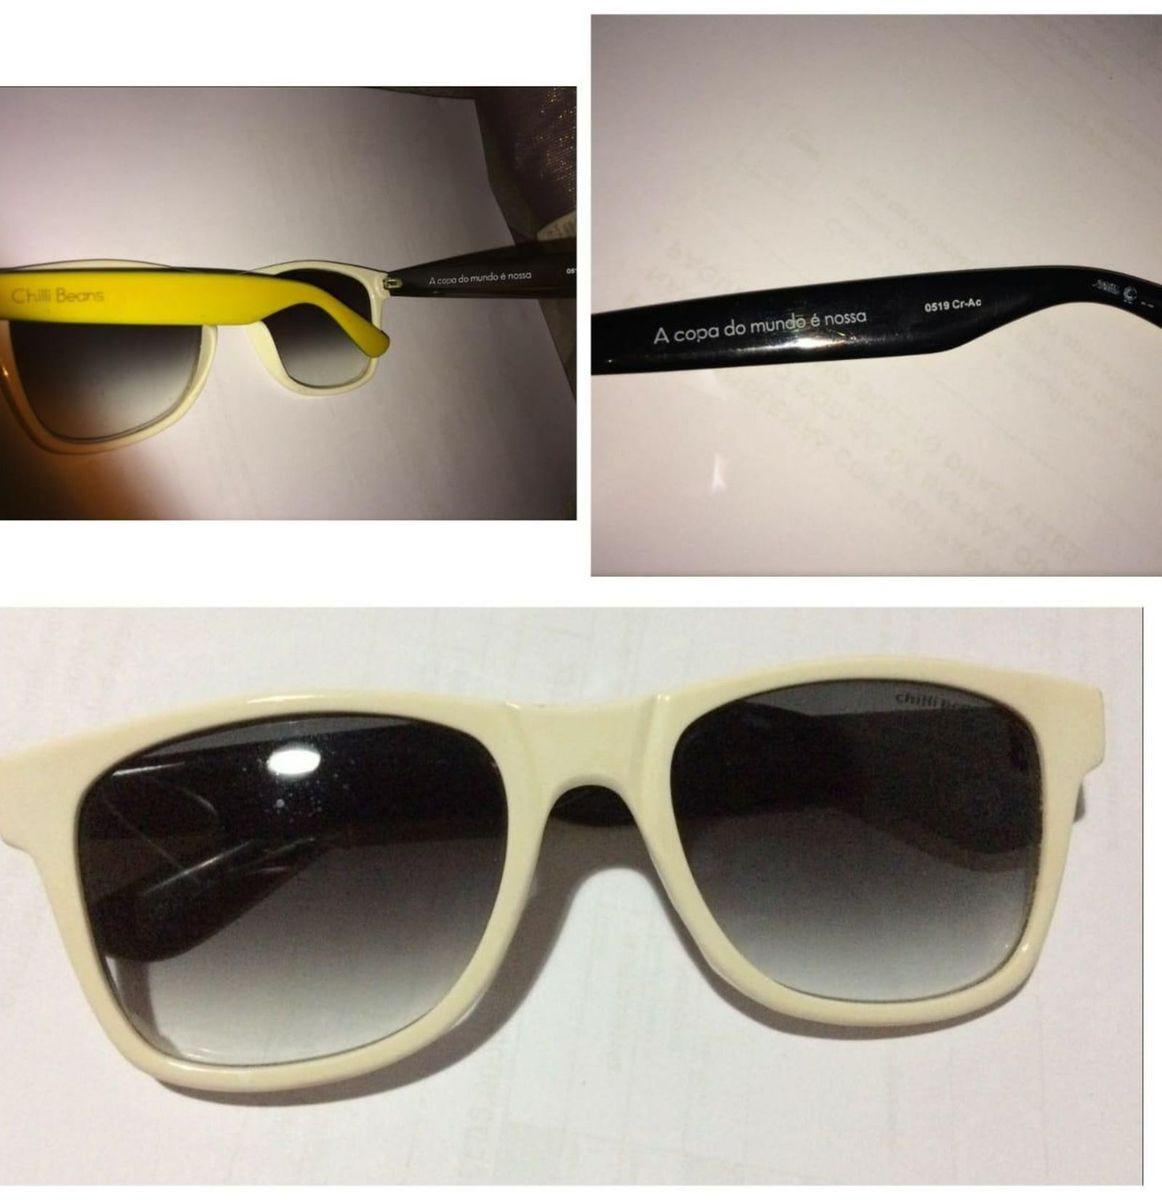 9375cddf6 Oculos Escuros Chilli Beans Especial | Óculos Feminino Chilli Beans ...